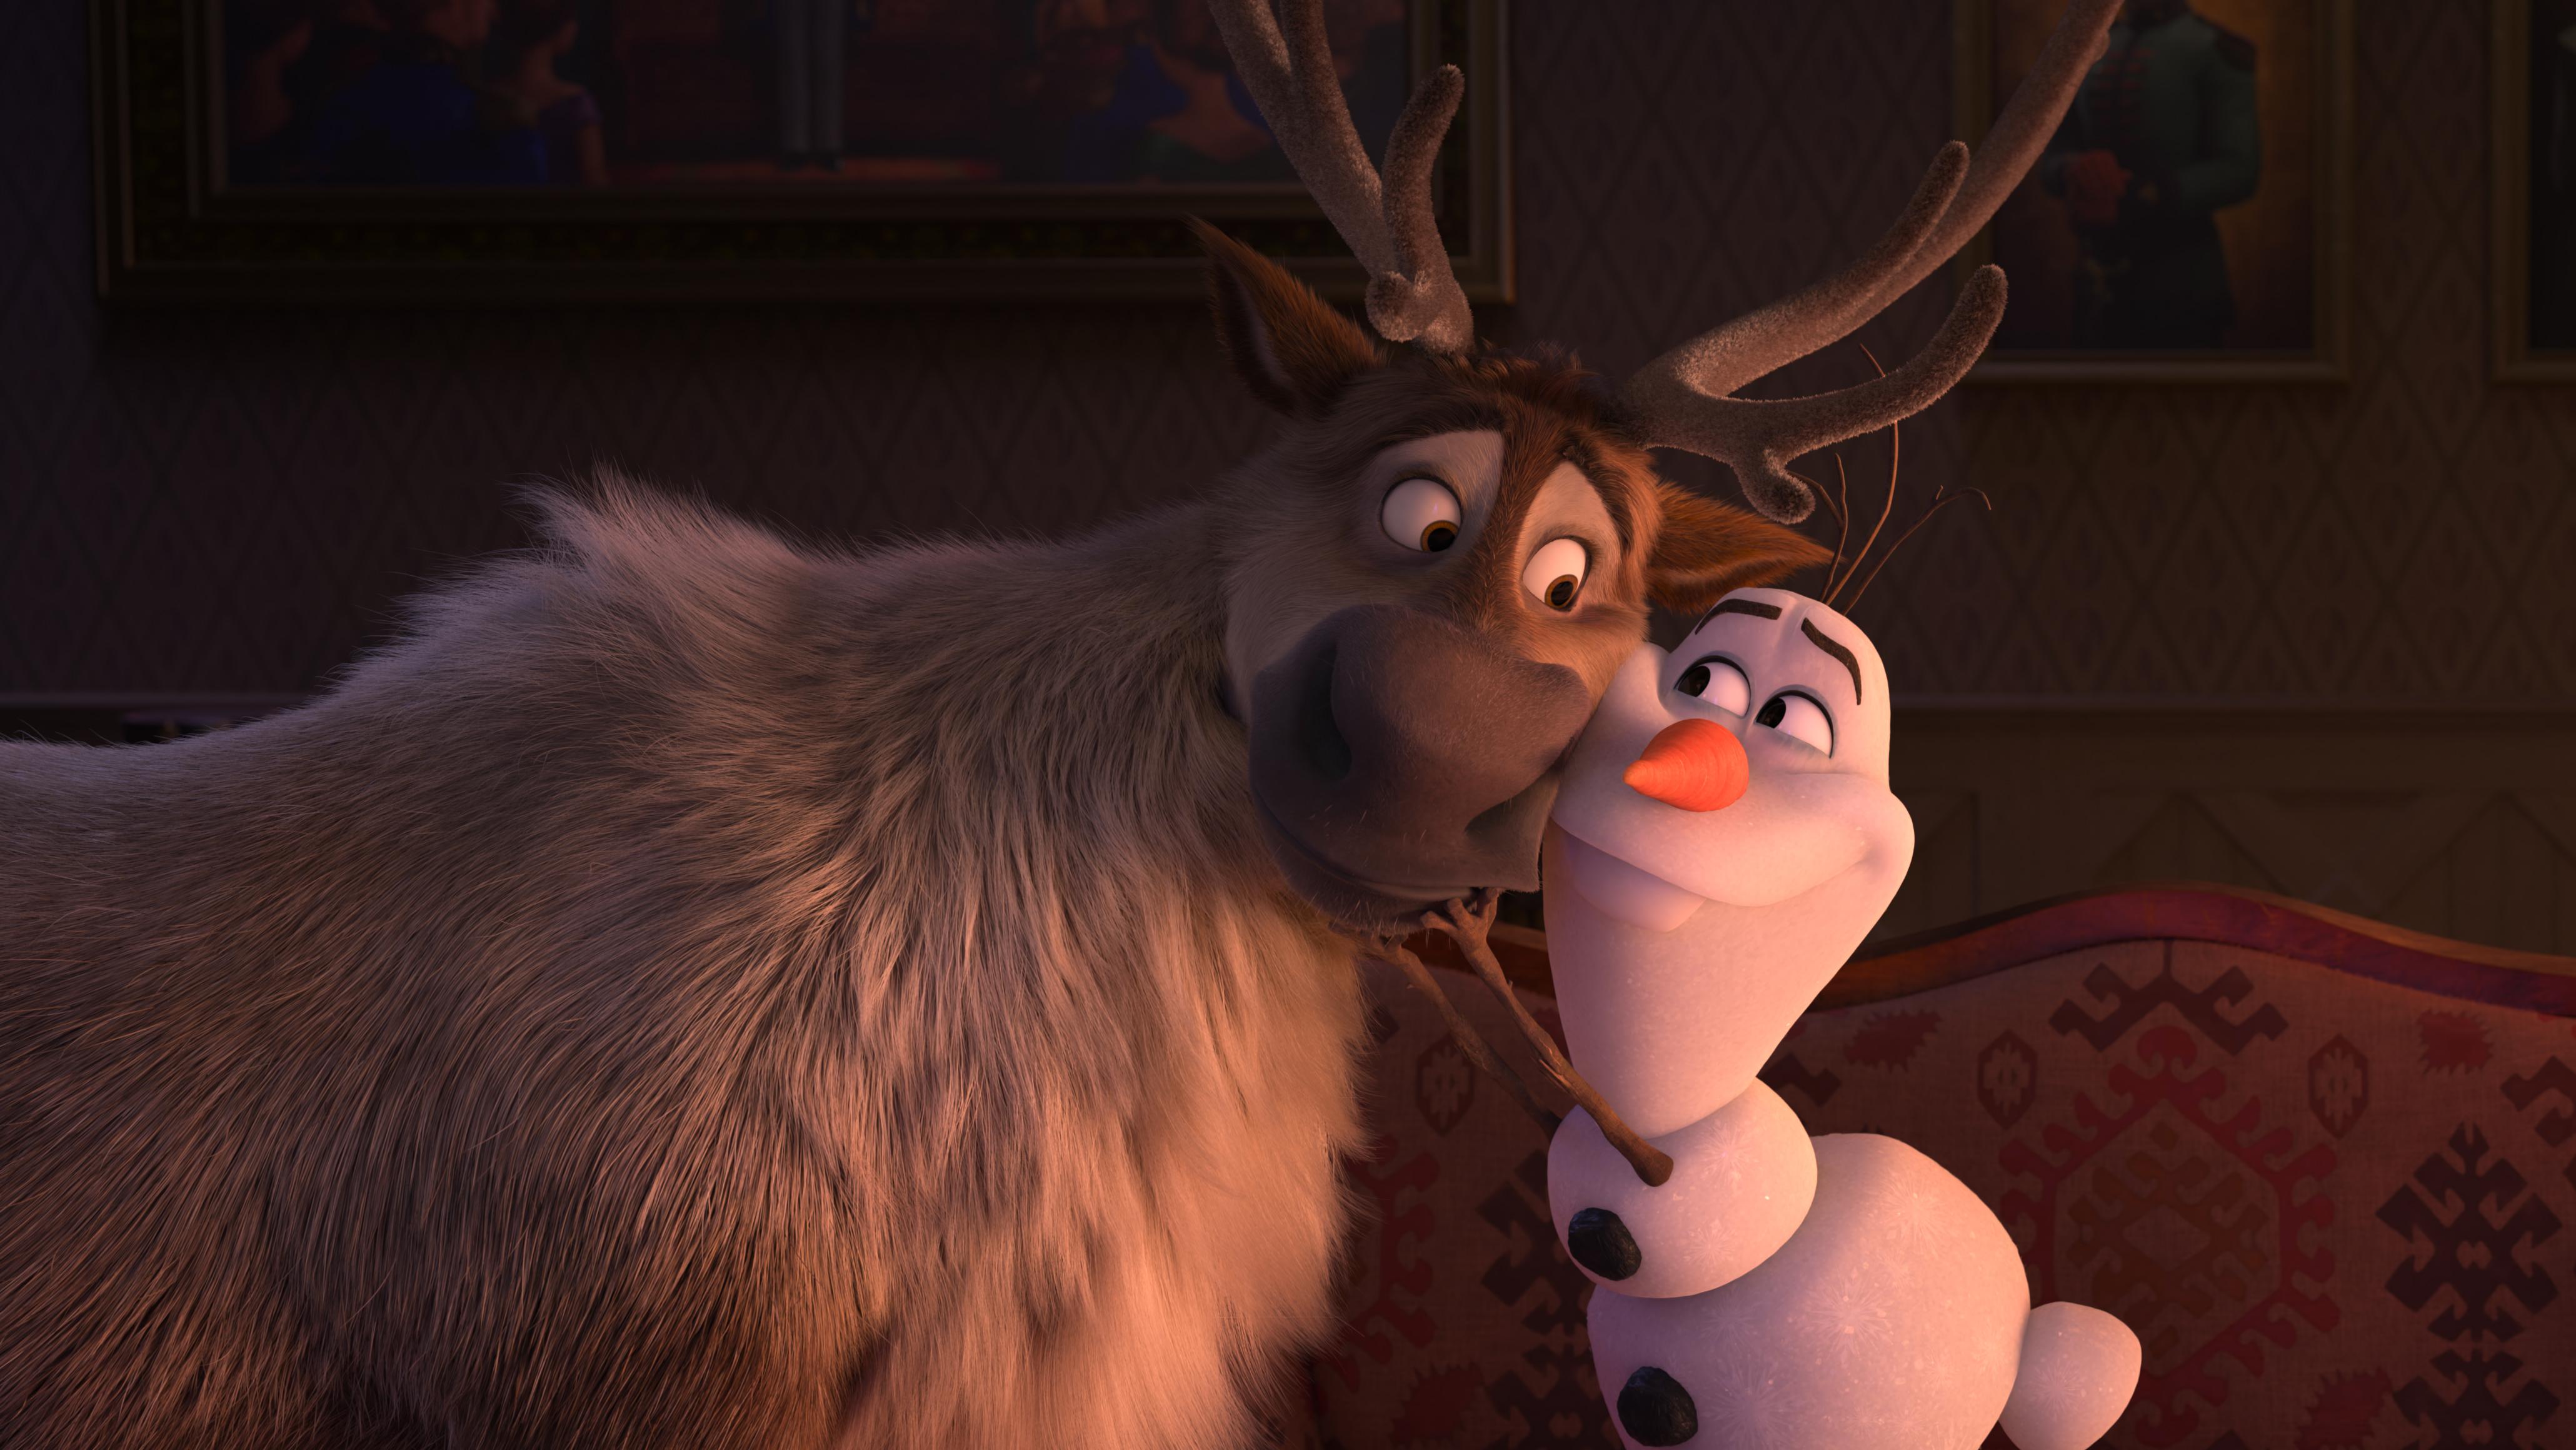 Sven and Olaf